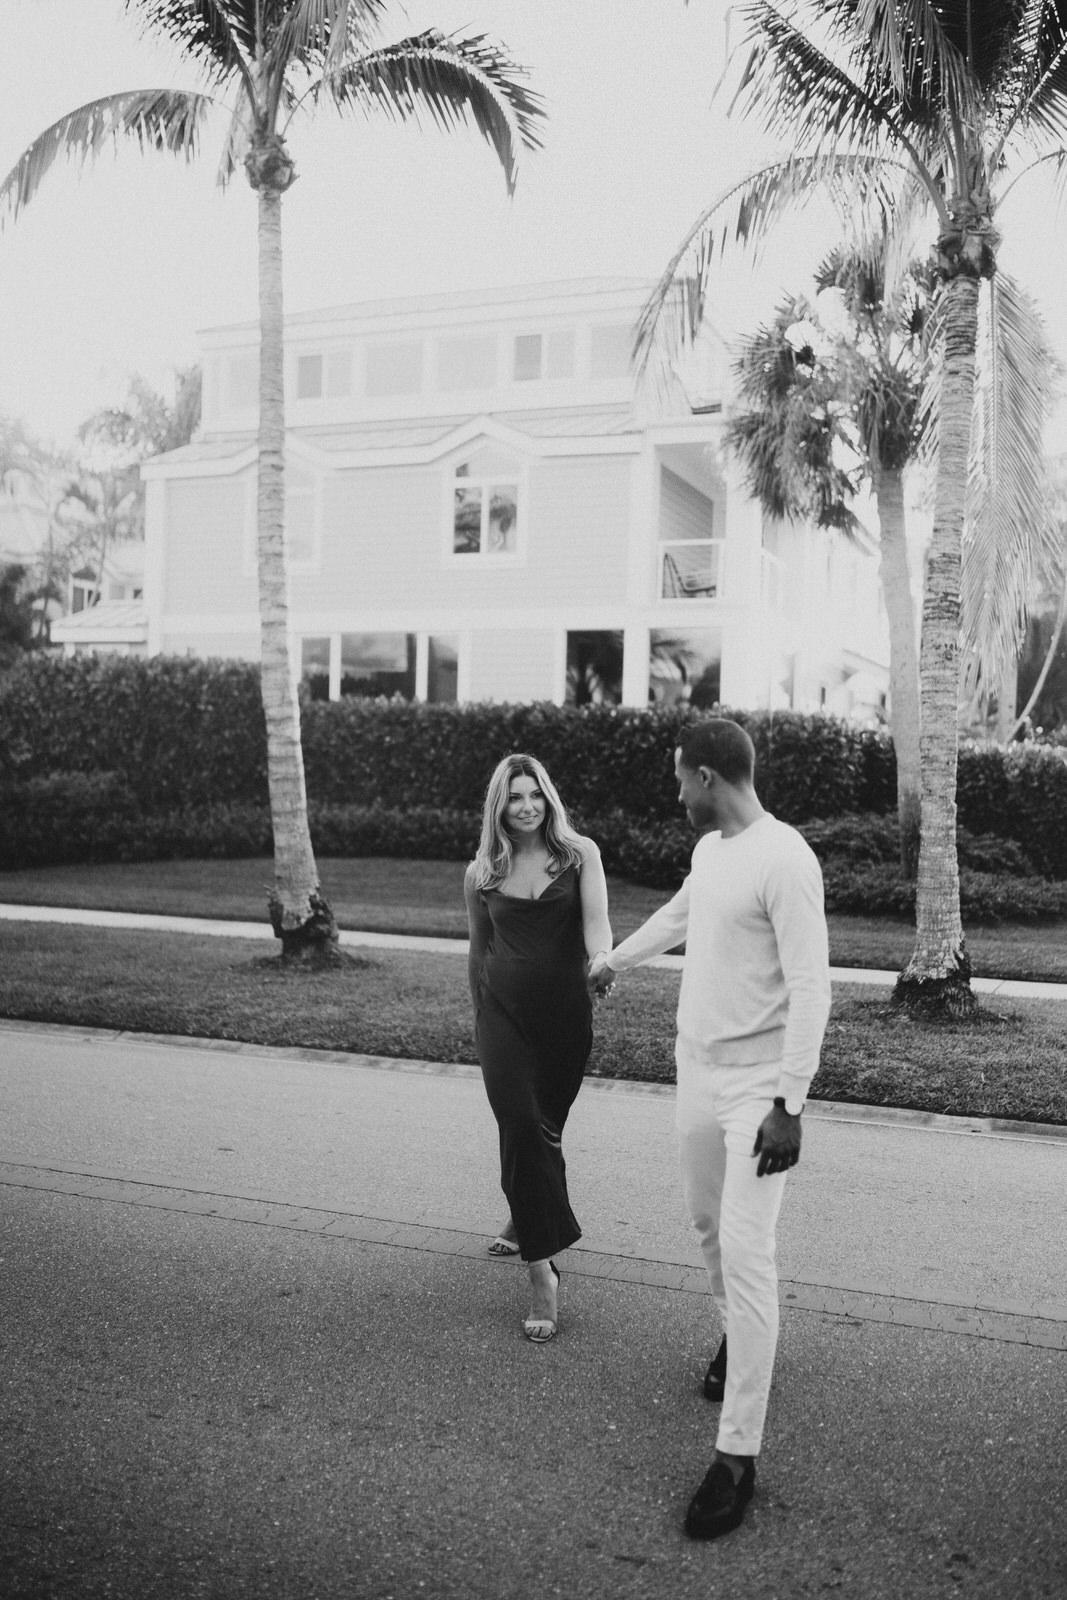 Naples 5th Ave Engagement Photos- Michelle Gonzalez Photography- Michele + Troy-240.JPG